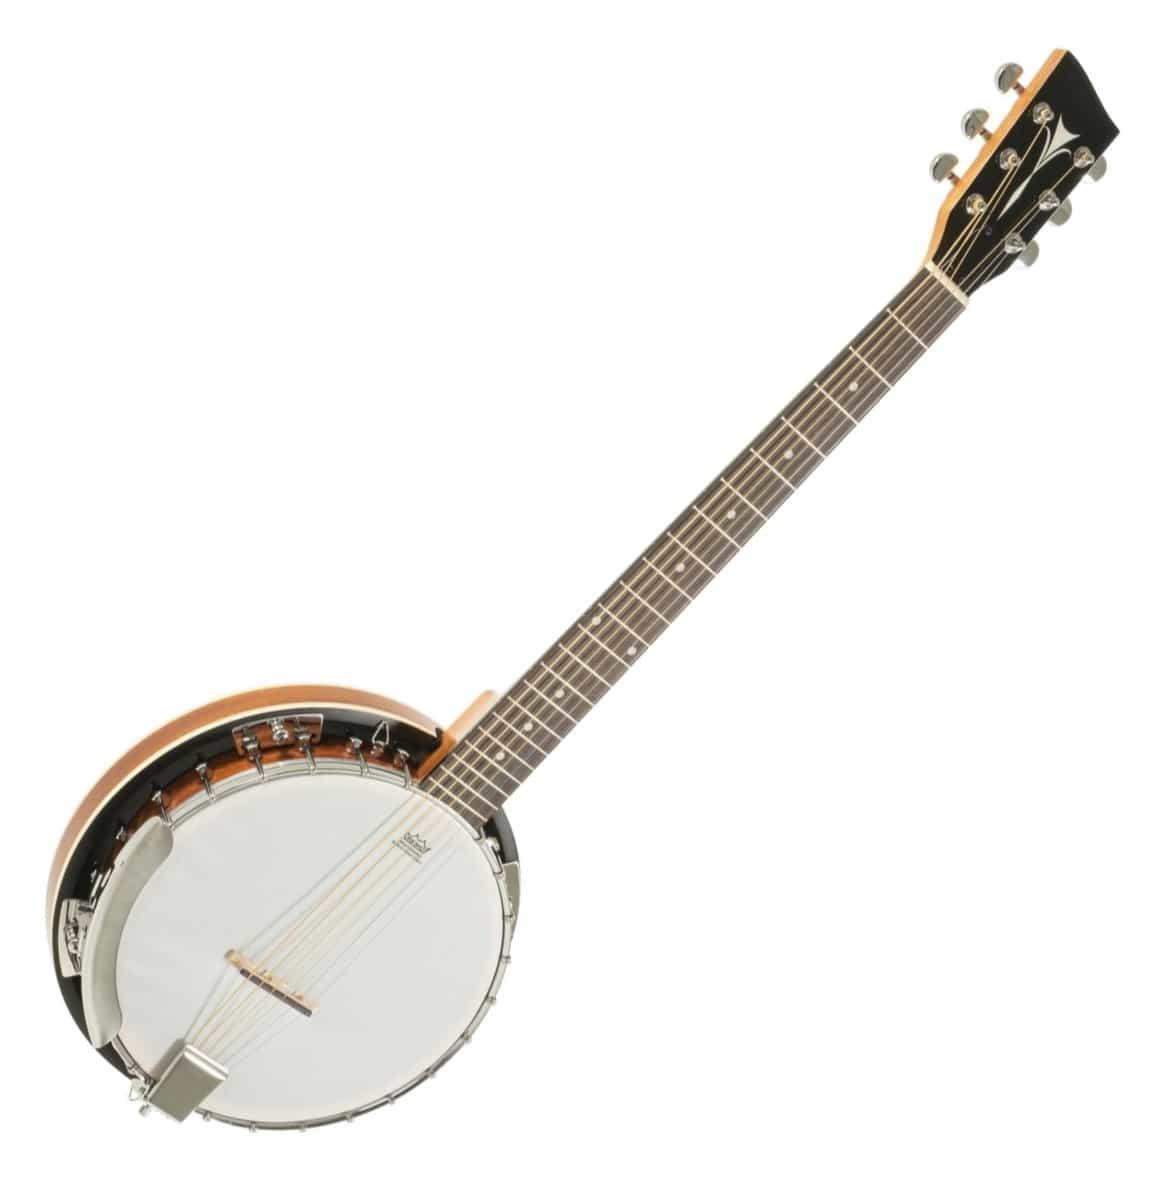 Sonstigezupf - VGS Select Banjo 6 string - Onlineshop Musikhaus Kirstein